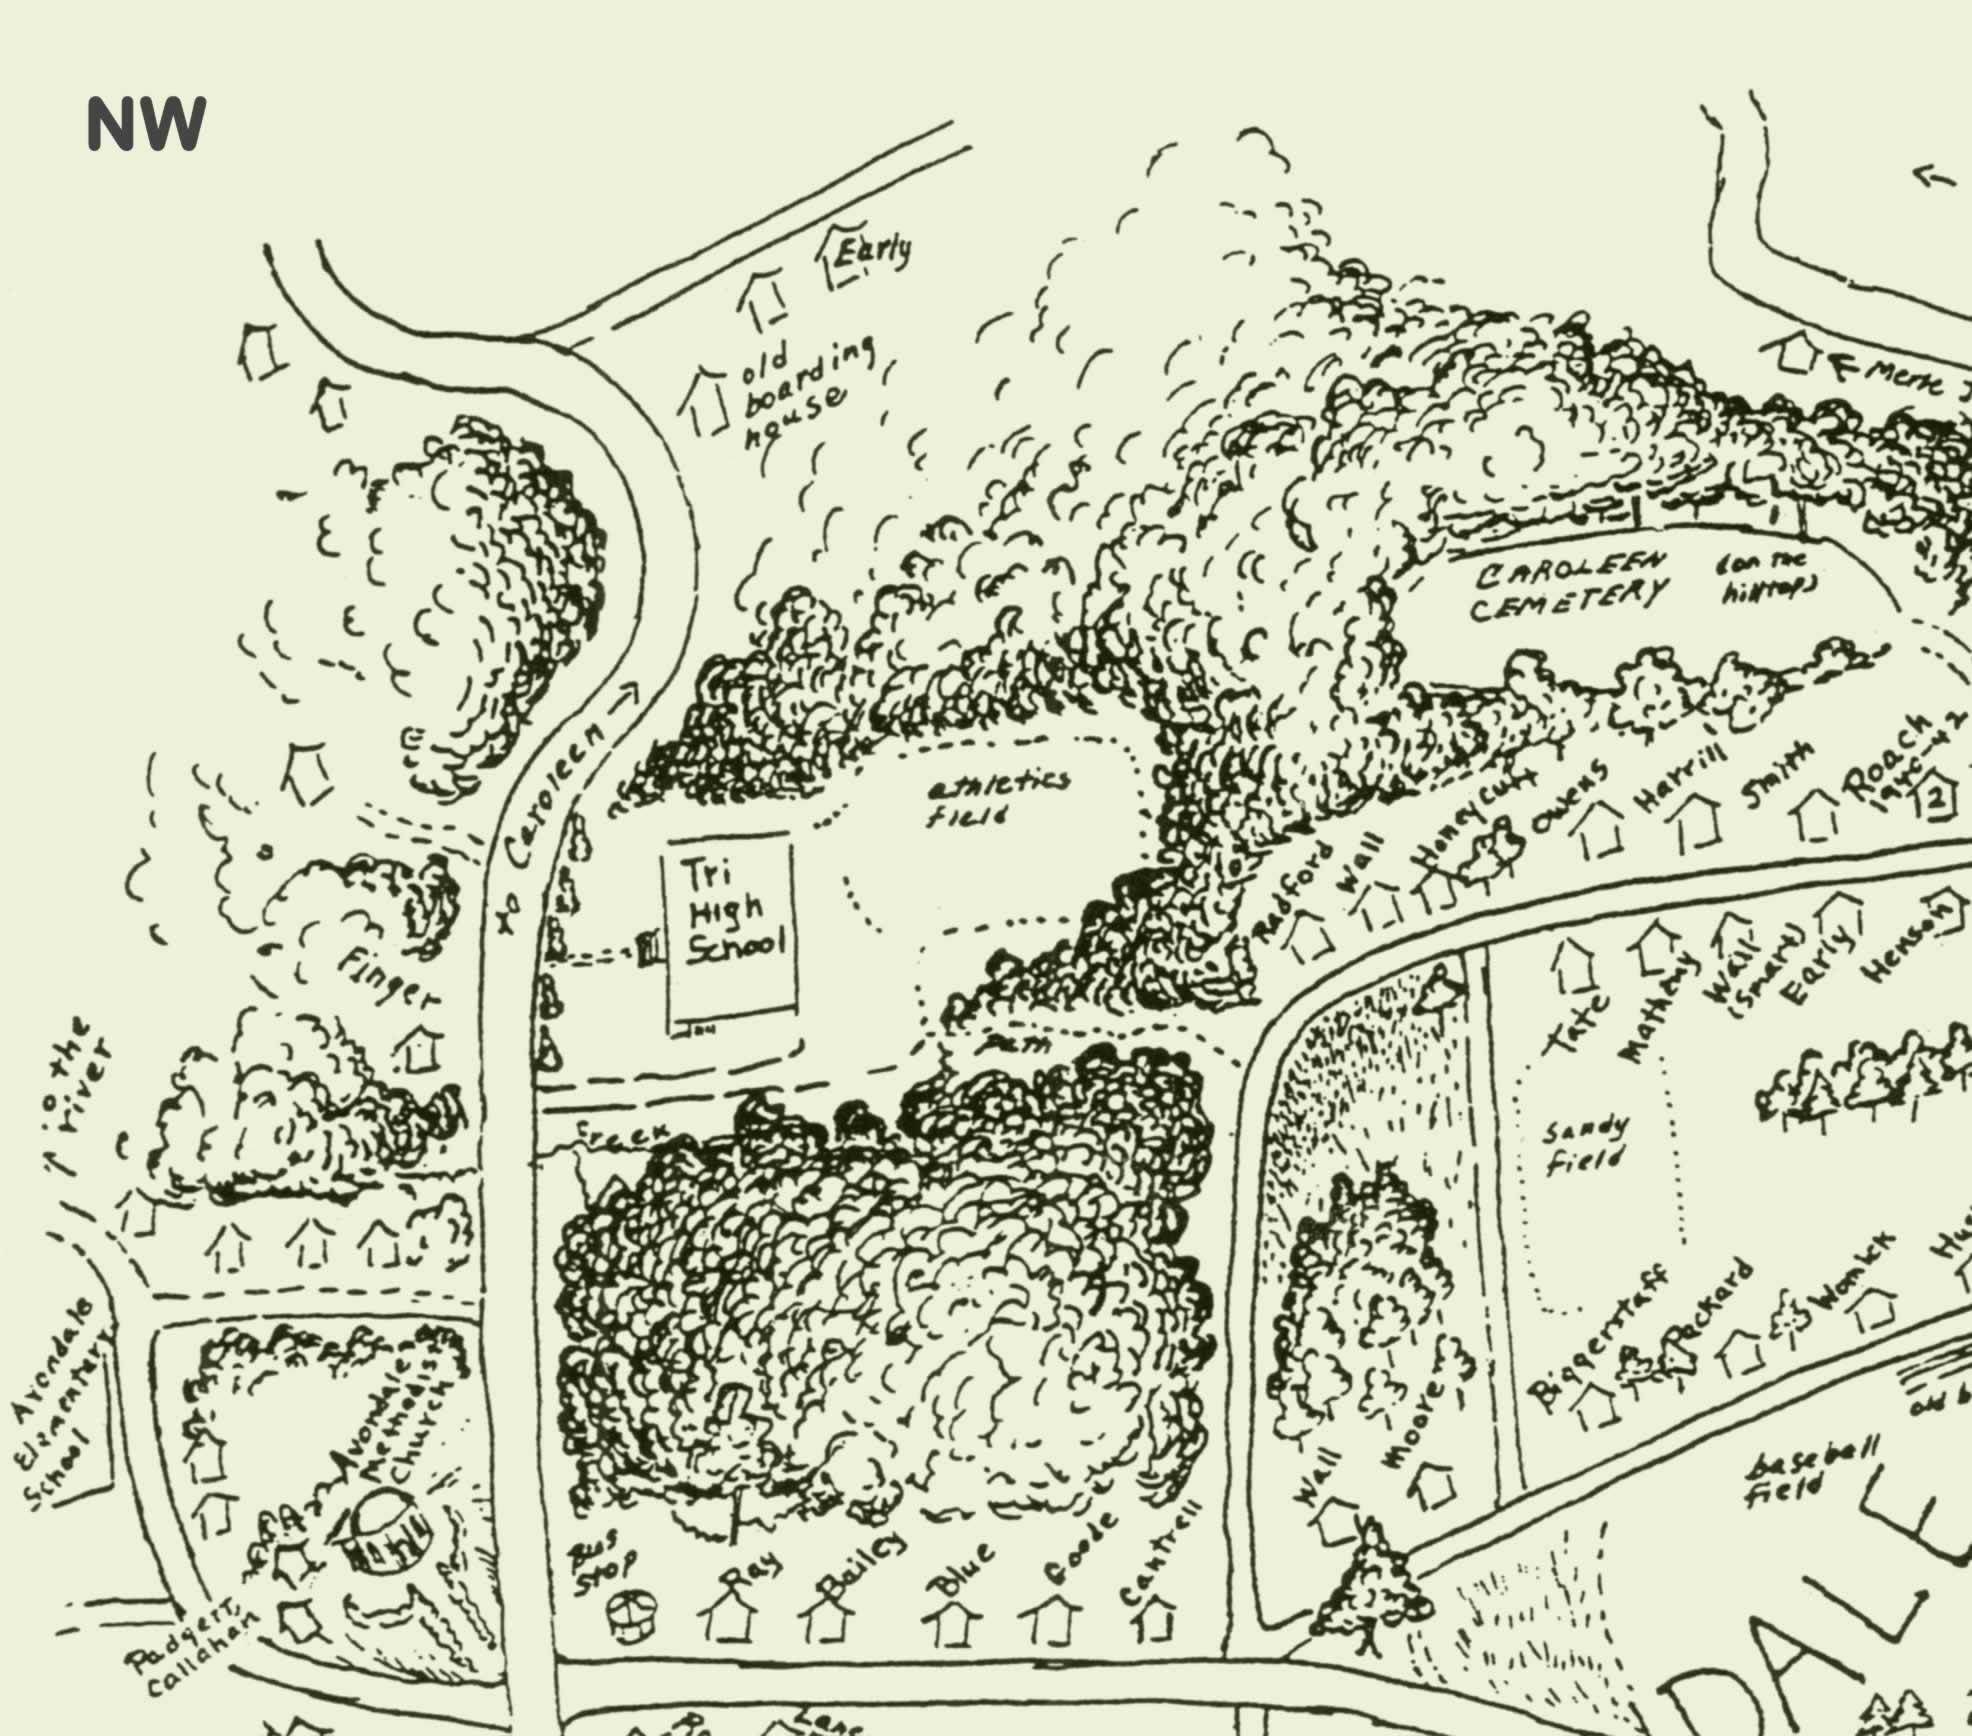 The northwestern quadrant of the map